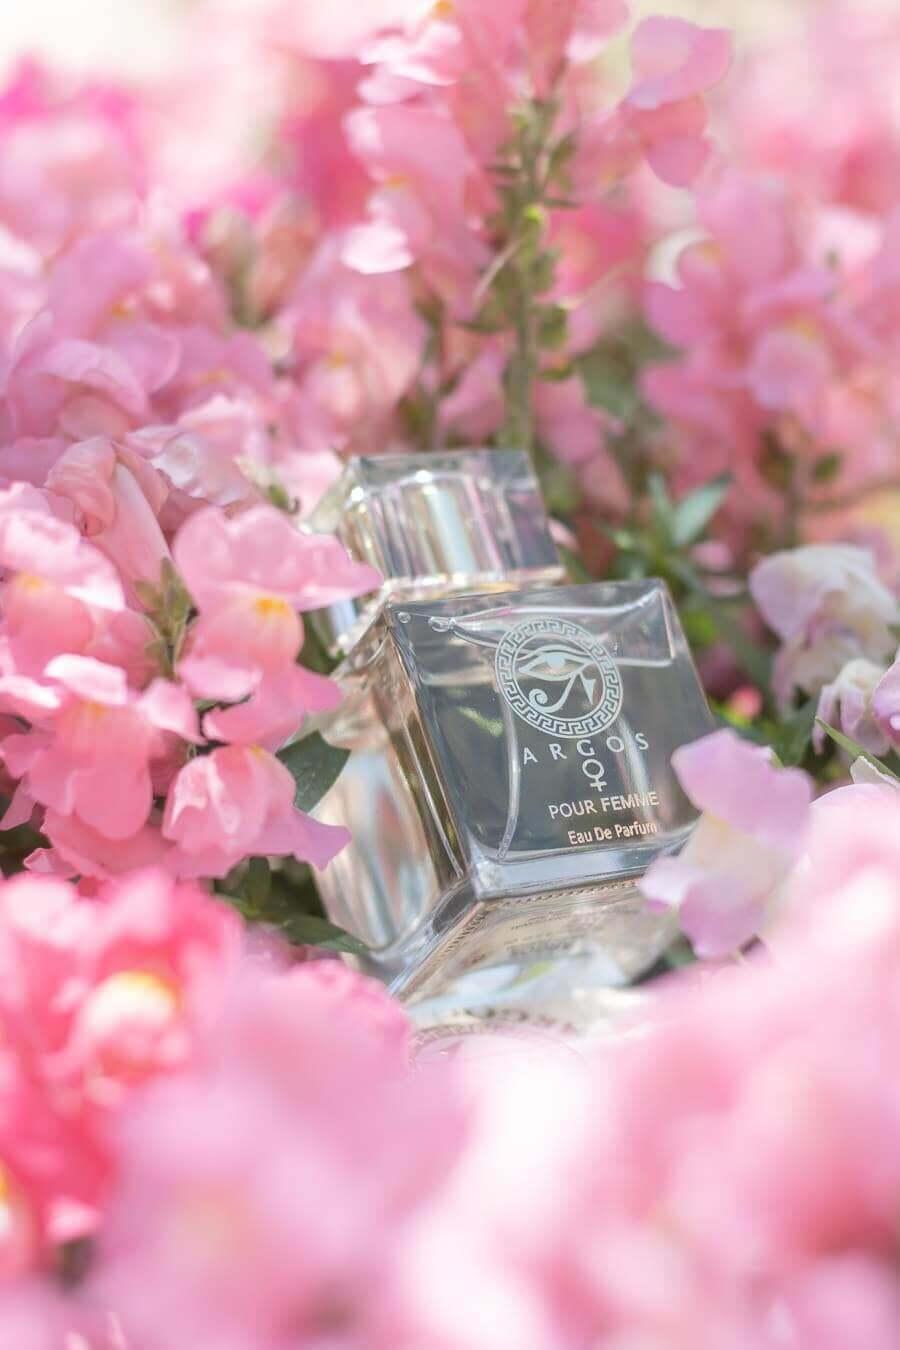 Argos Fragrances Samples